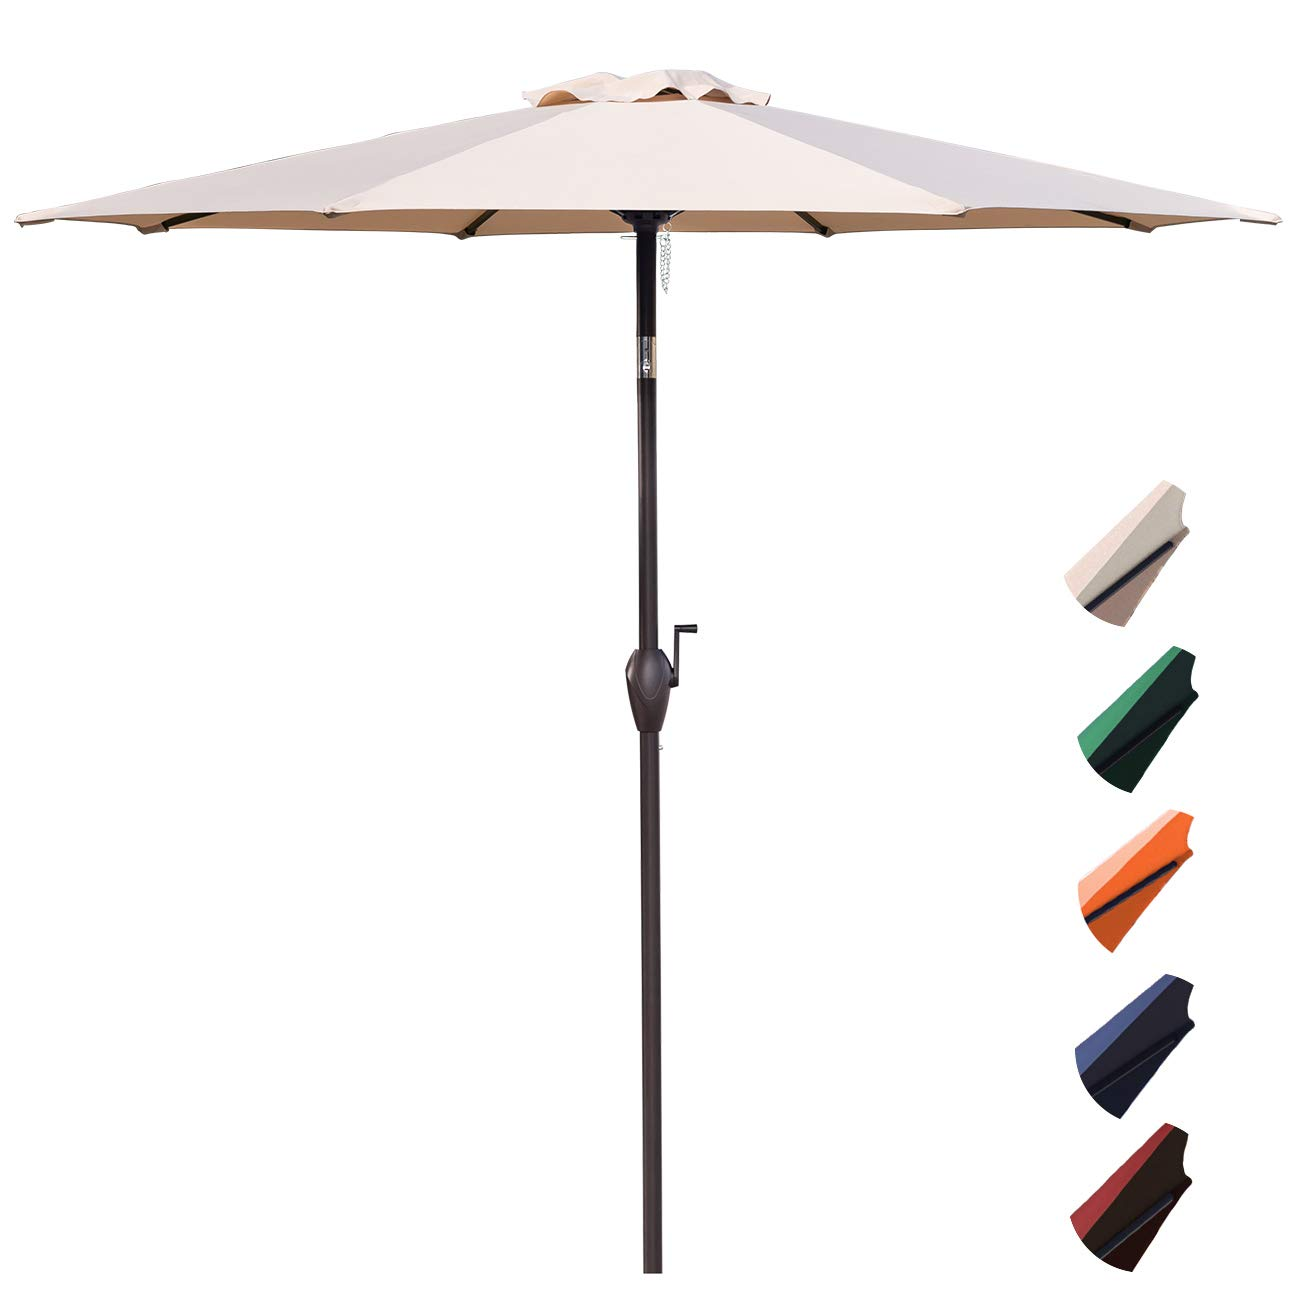 RUBEDER 9' Patio Umbrella Outdoor Market Table Umbrella with 8 Sturdy Ribs,Wing Vent,Push Button Tilt & Crank (9 Ft, Beige 2)